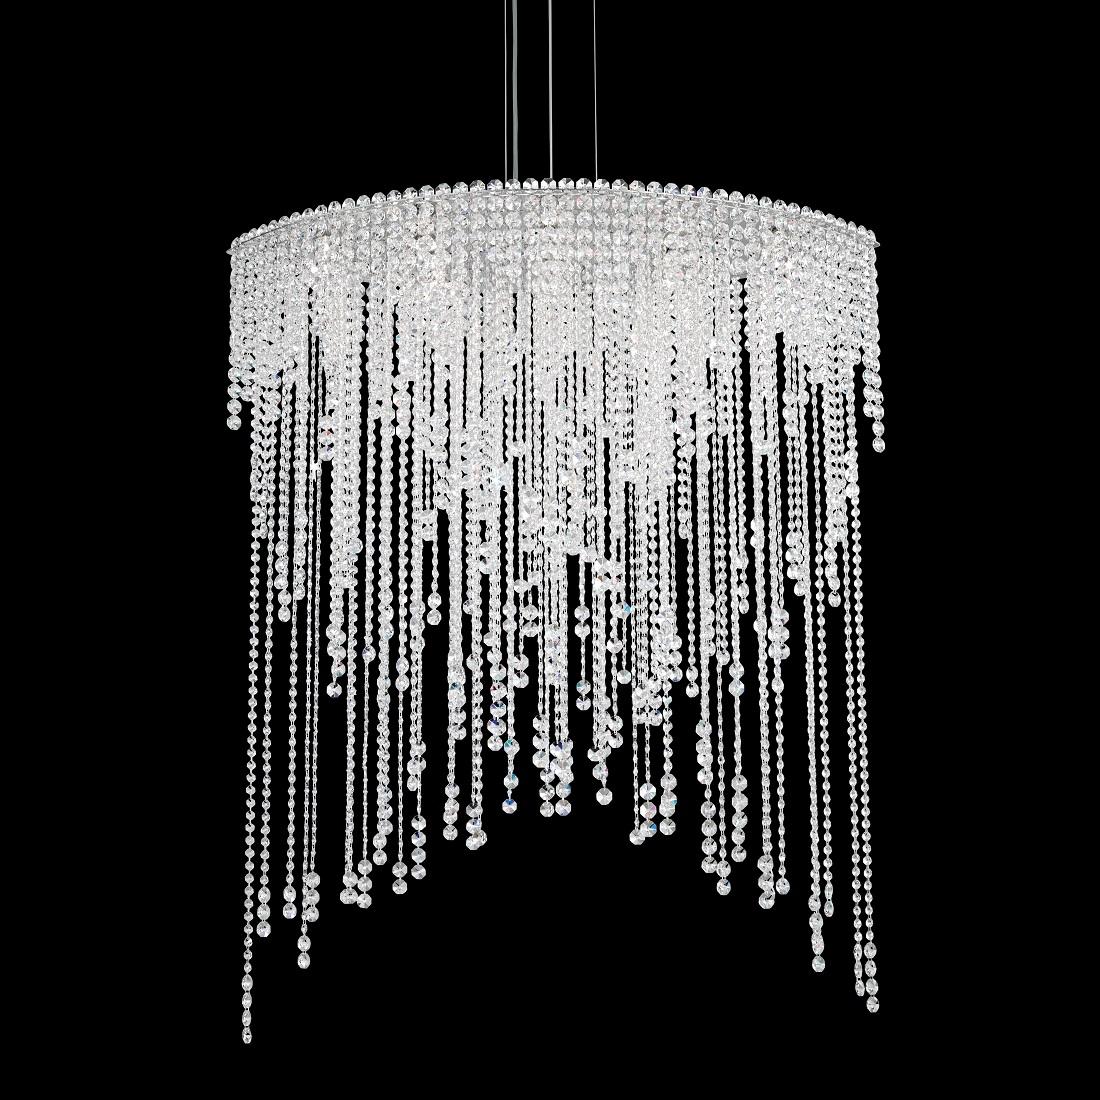 Schonbek Pendant Lighting Brooklyn,New York  - Accentuations Brand